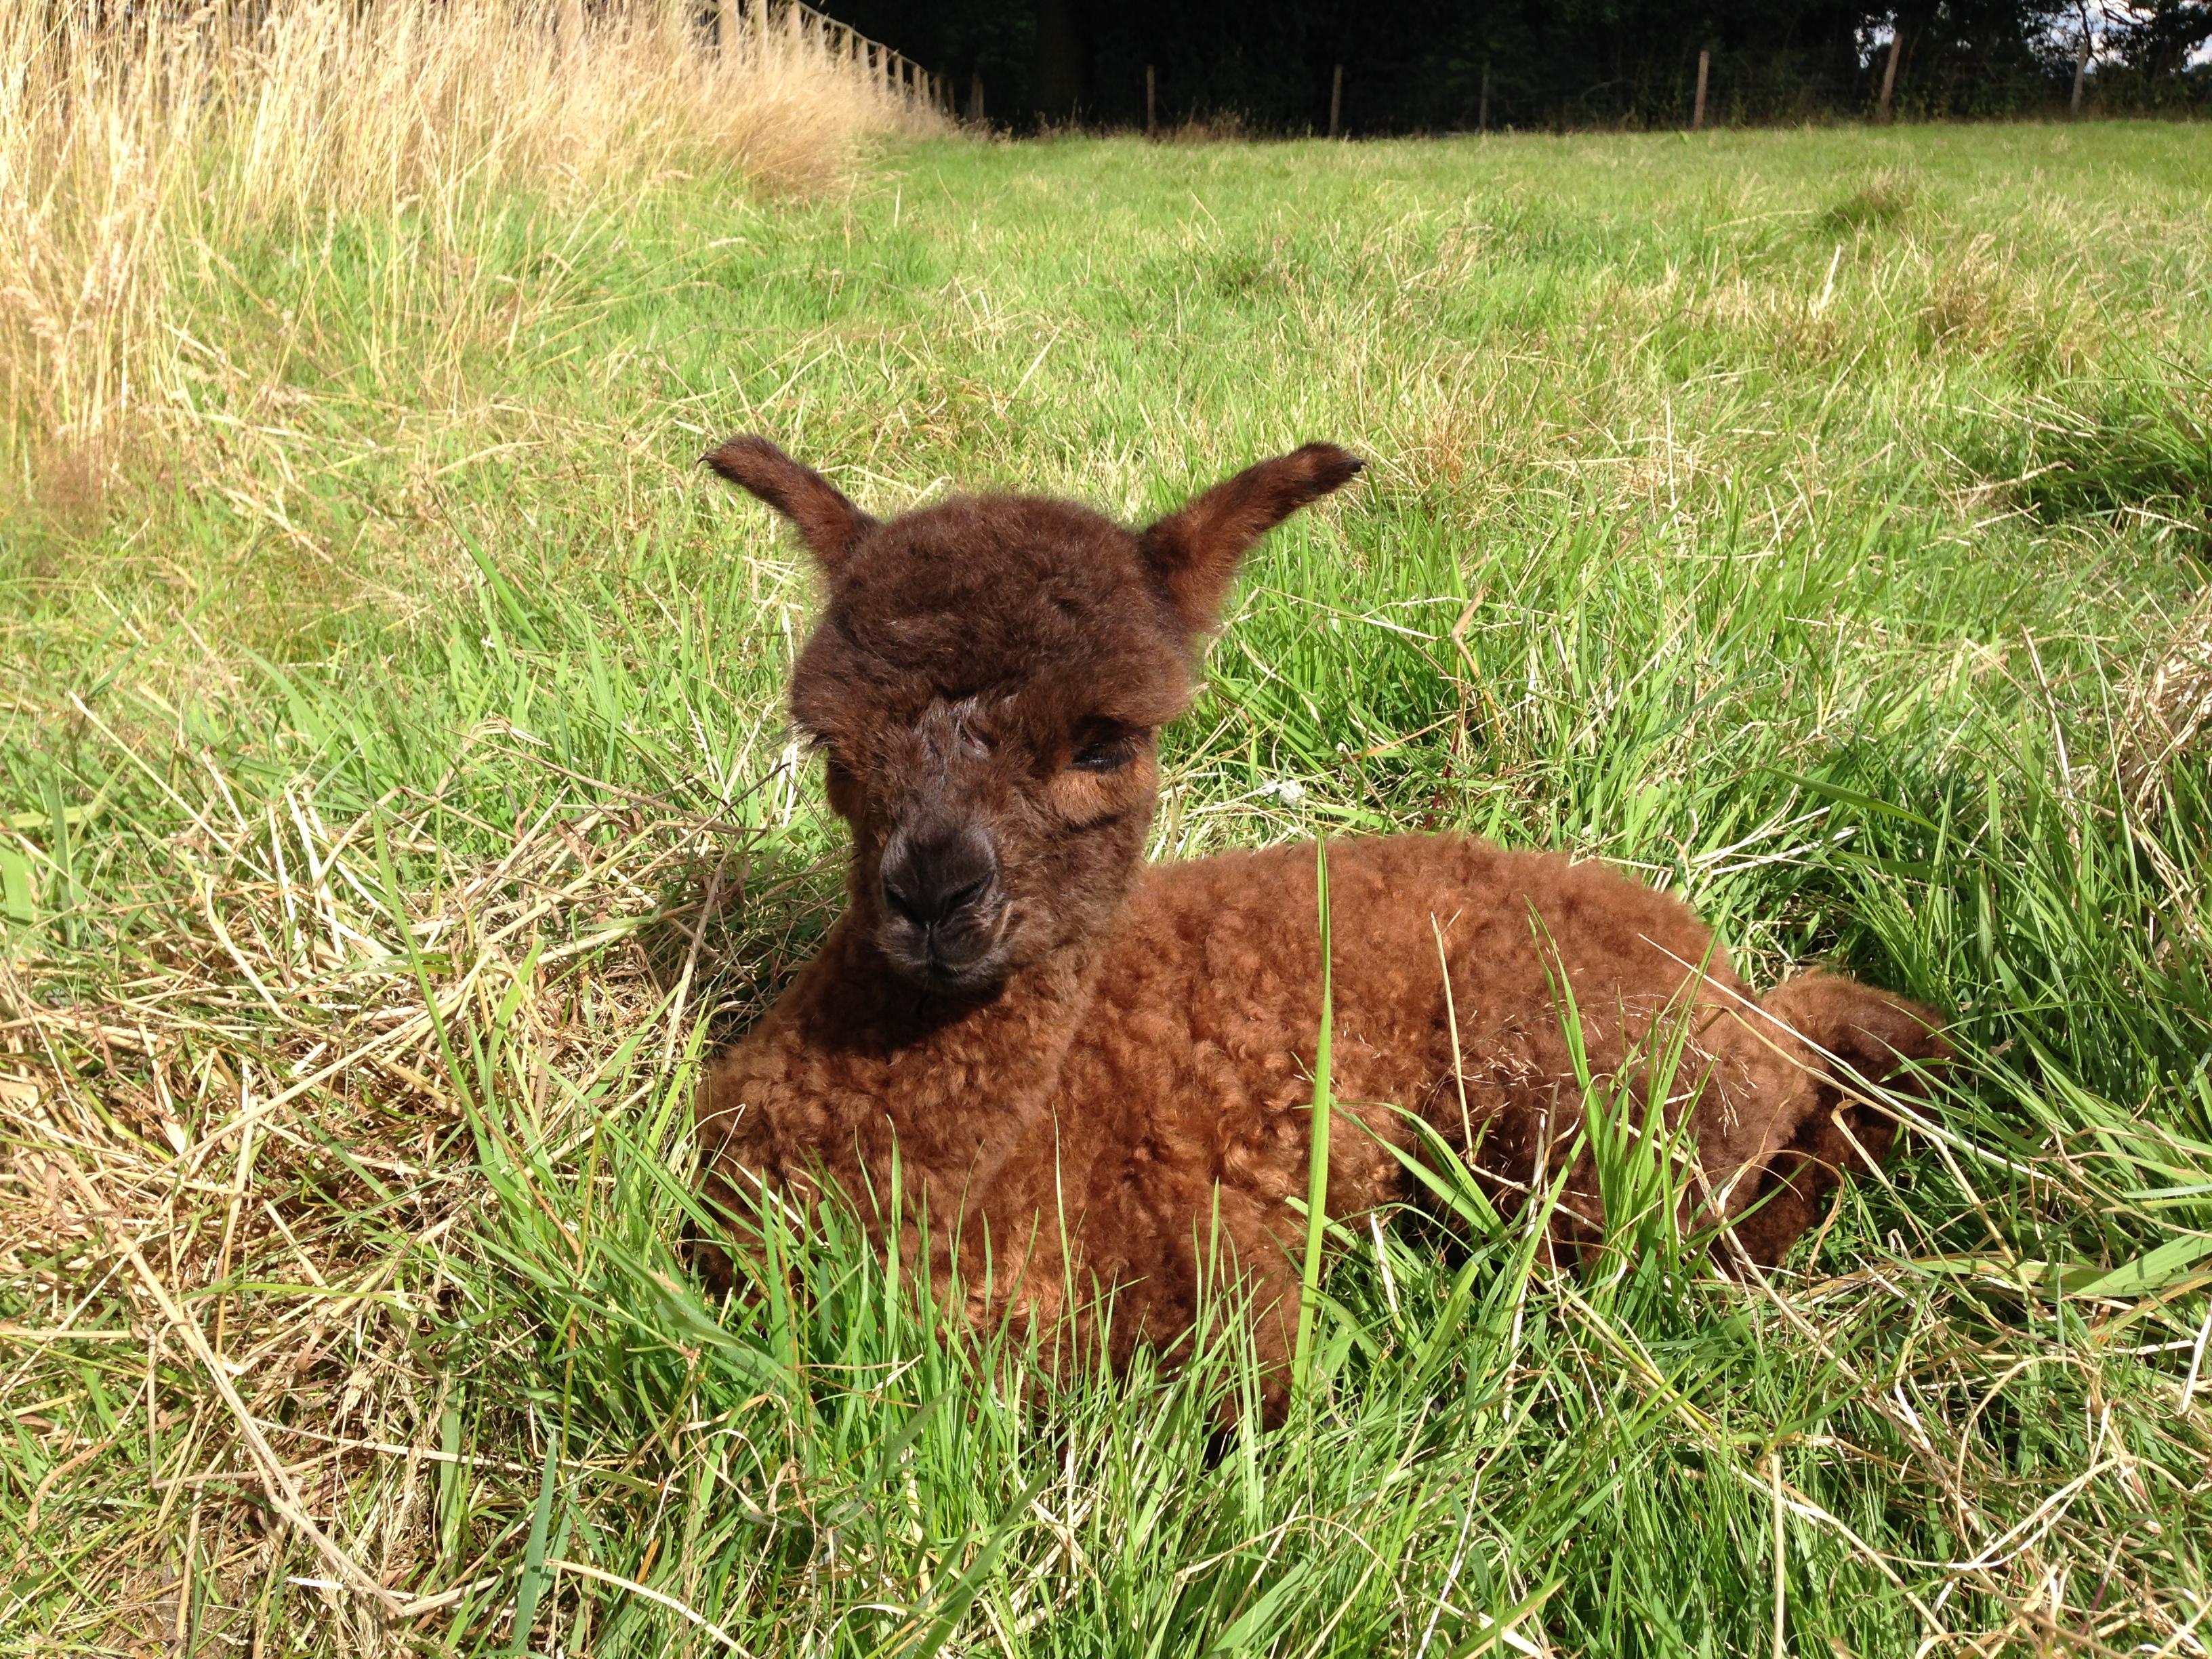 Shareshill Alpacas